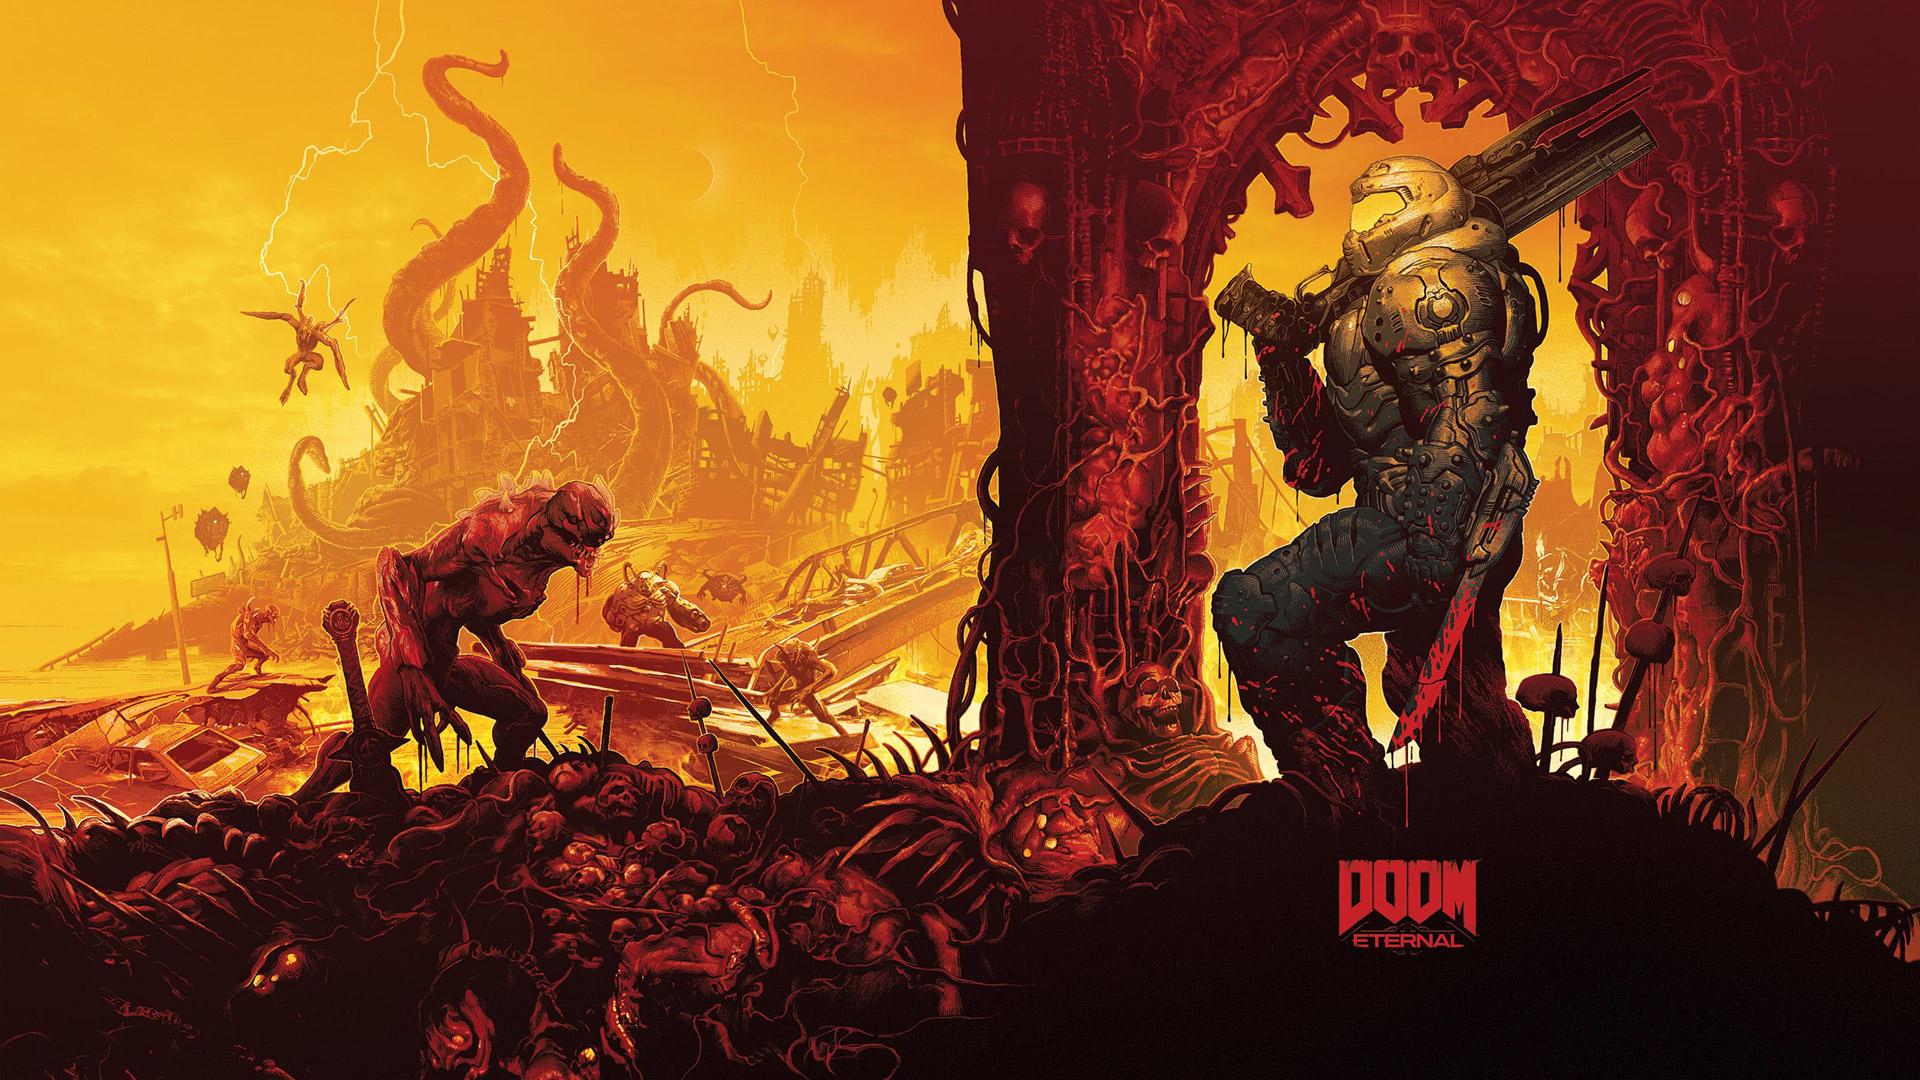 Free Doom Eternal Wallpaper in 1920x1080